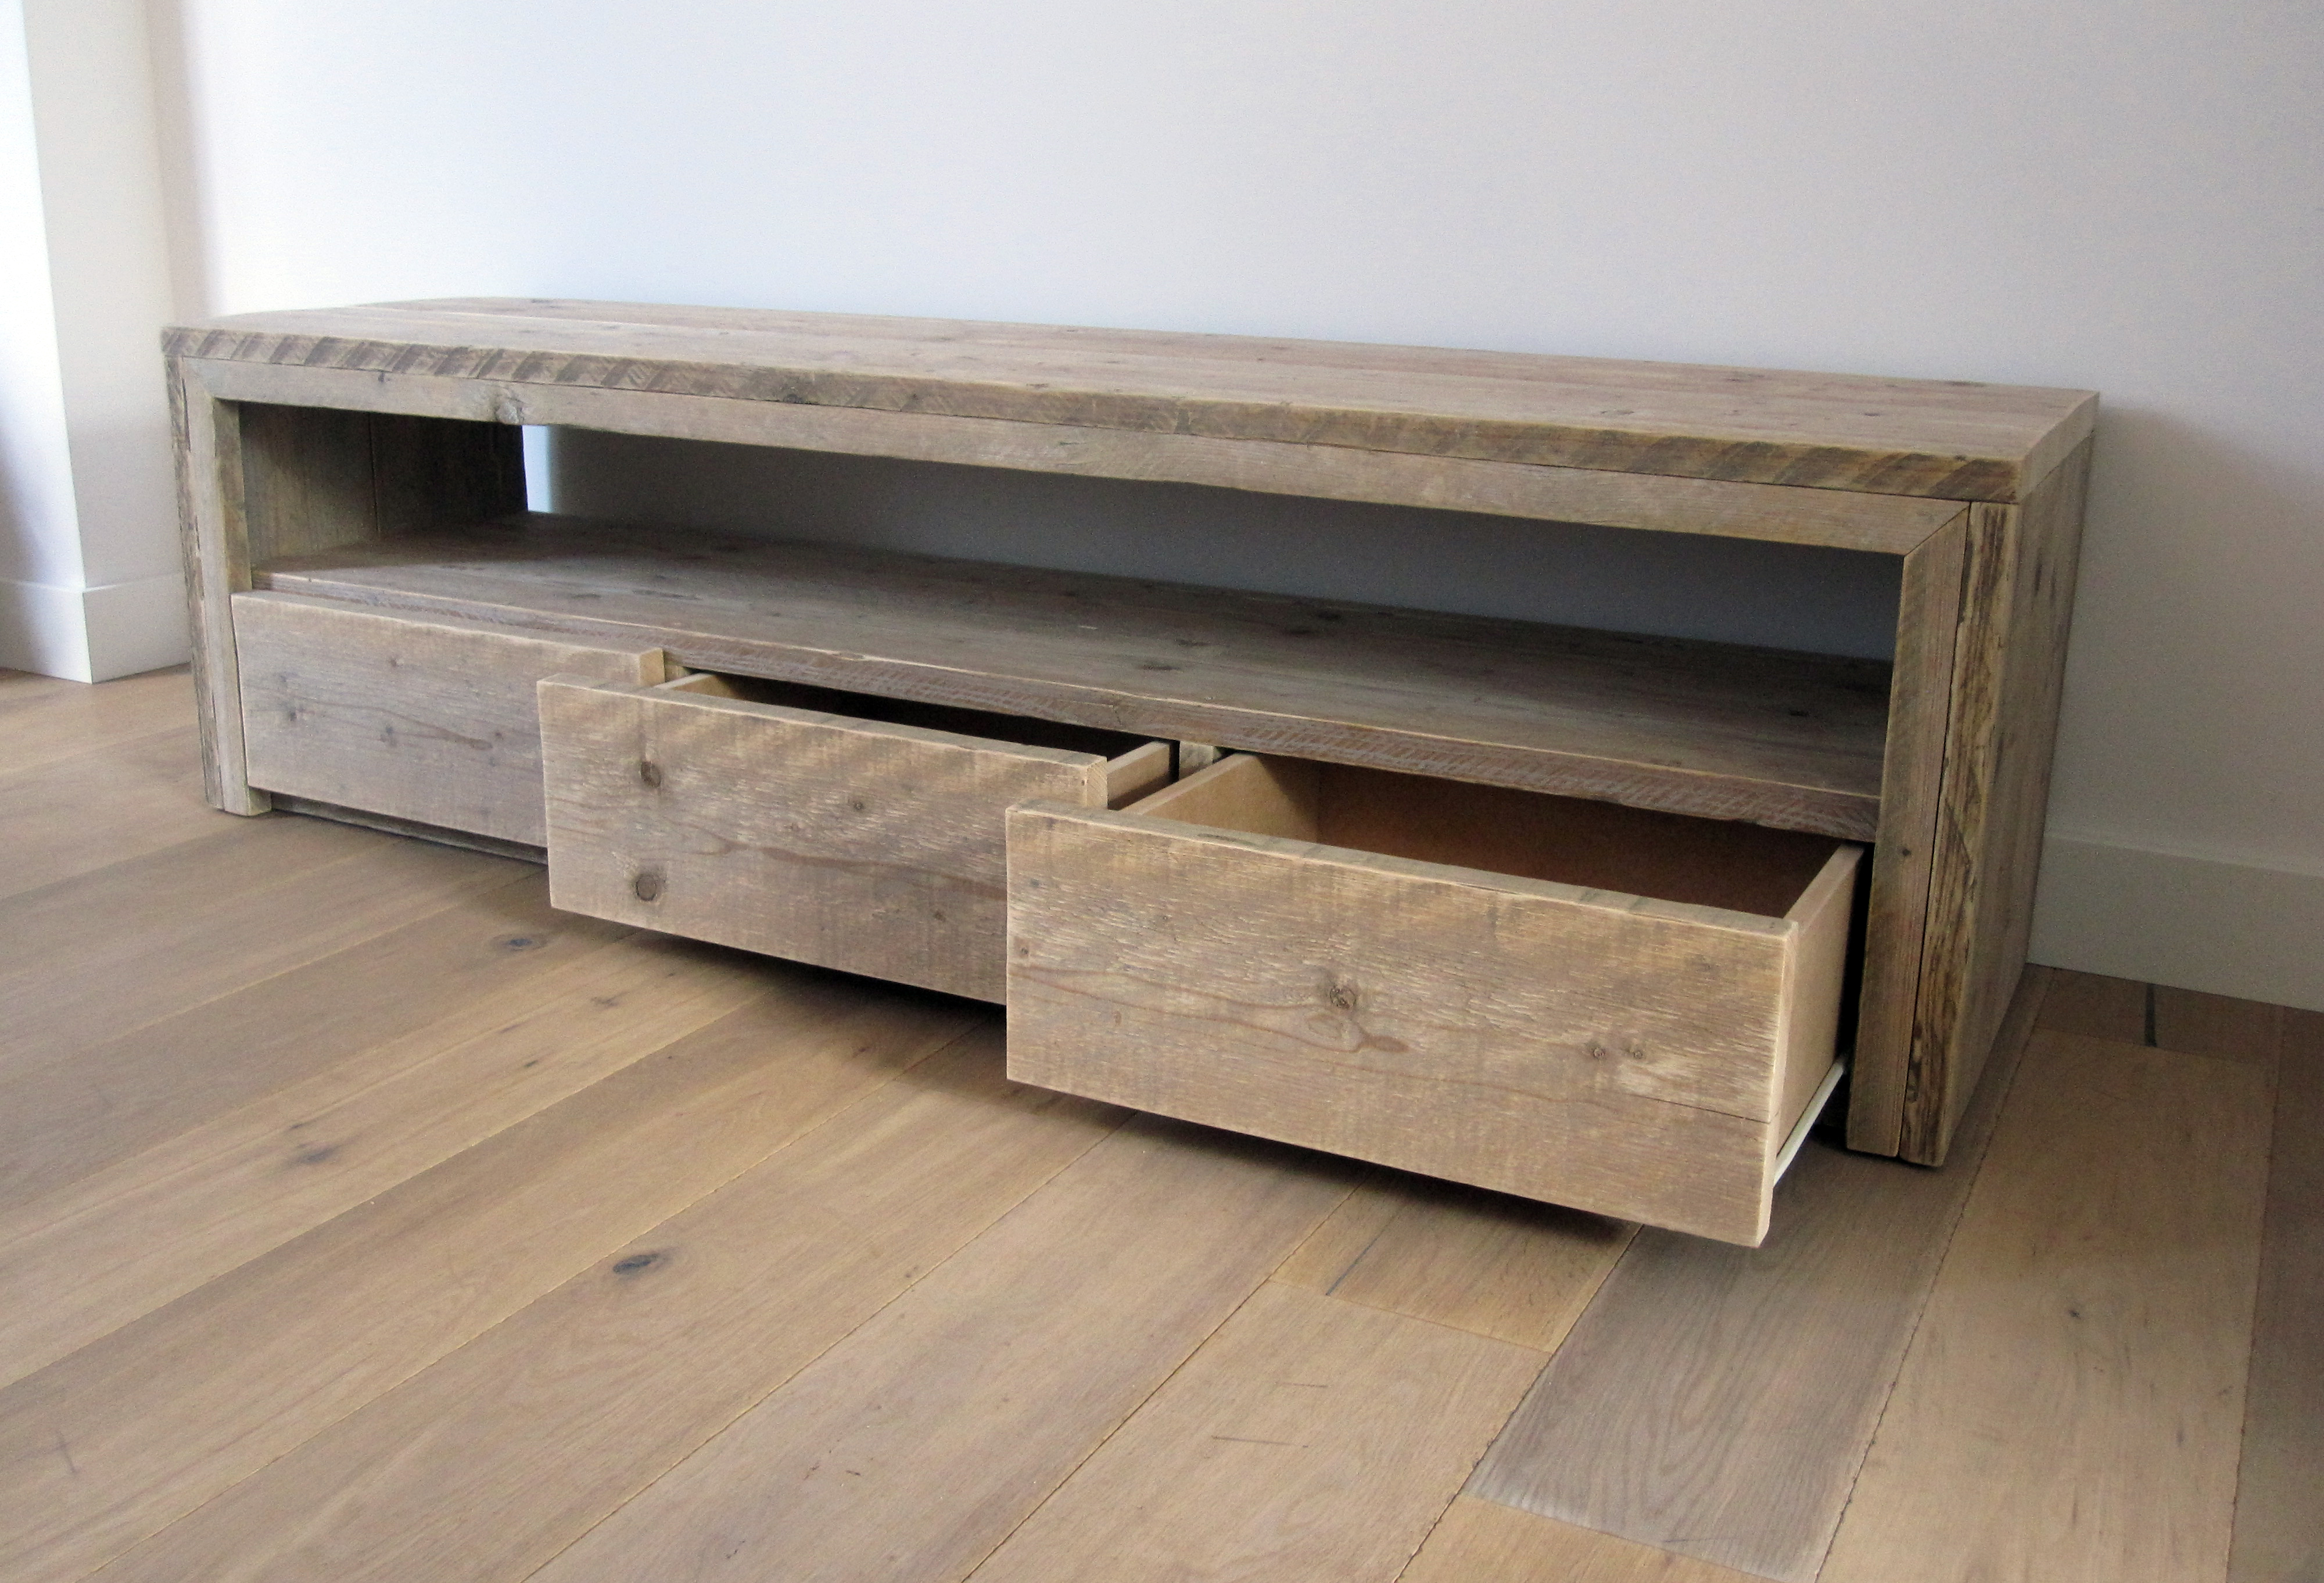 Tv meubel 39 vittali 39 steigerhout te koop bij w00tdesign for Tv meubel steigerhout